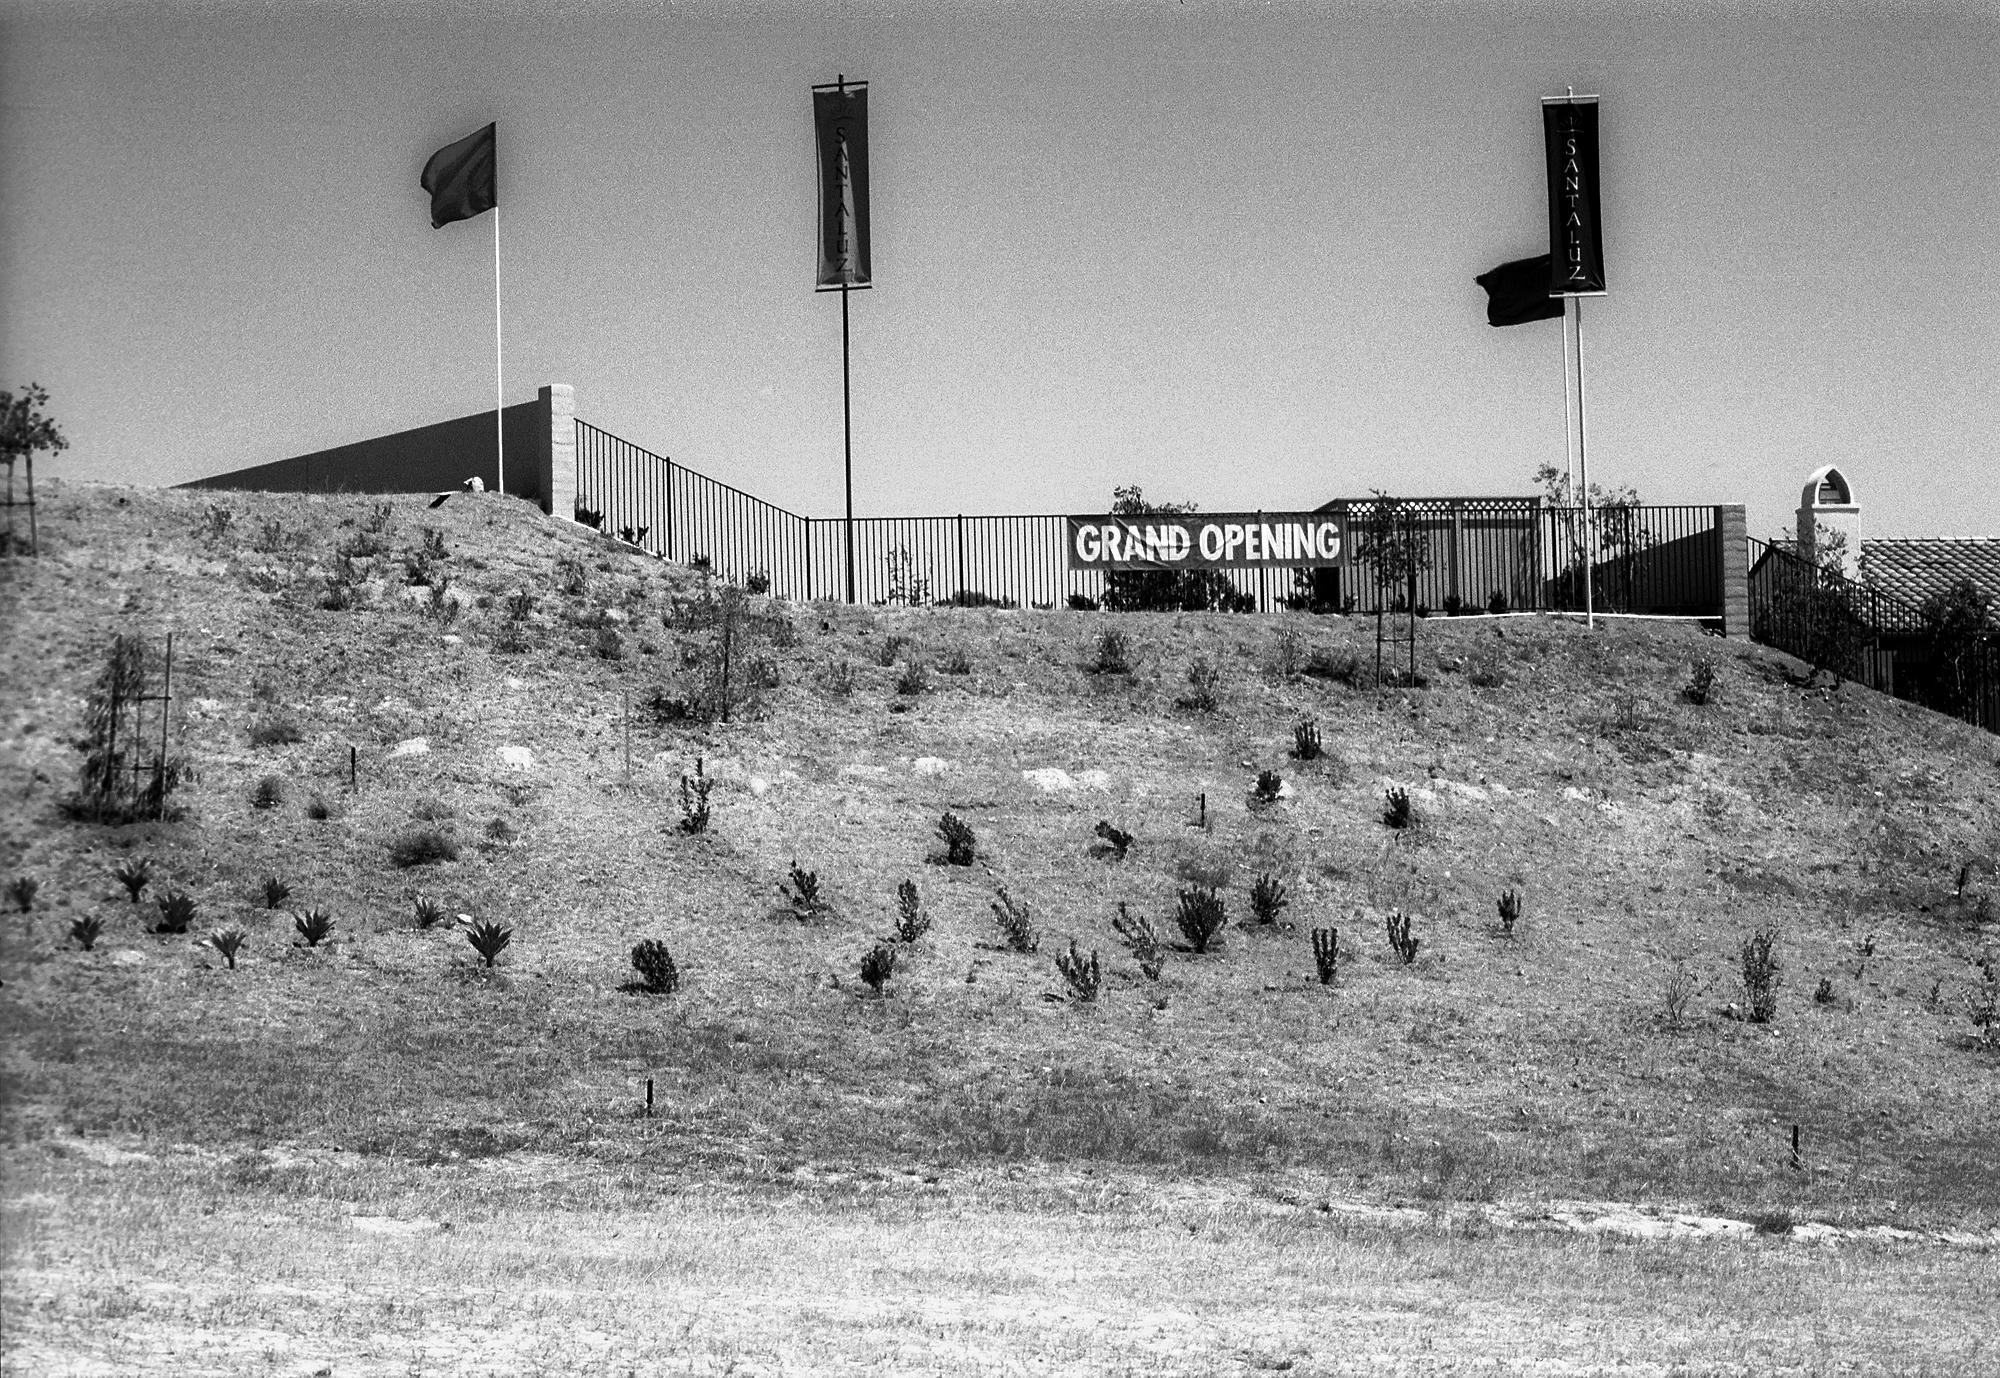 Fairbanks Ranch, San Diego, California, 2002